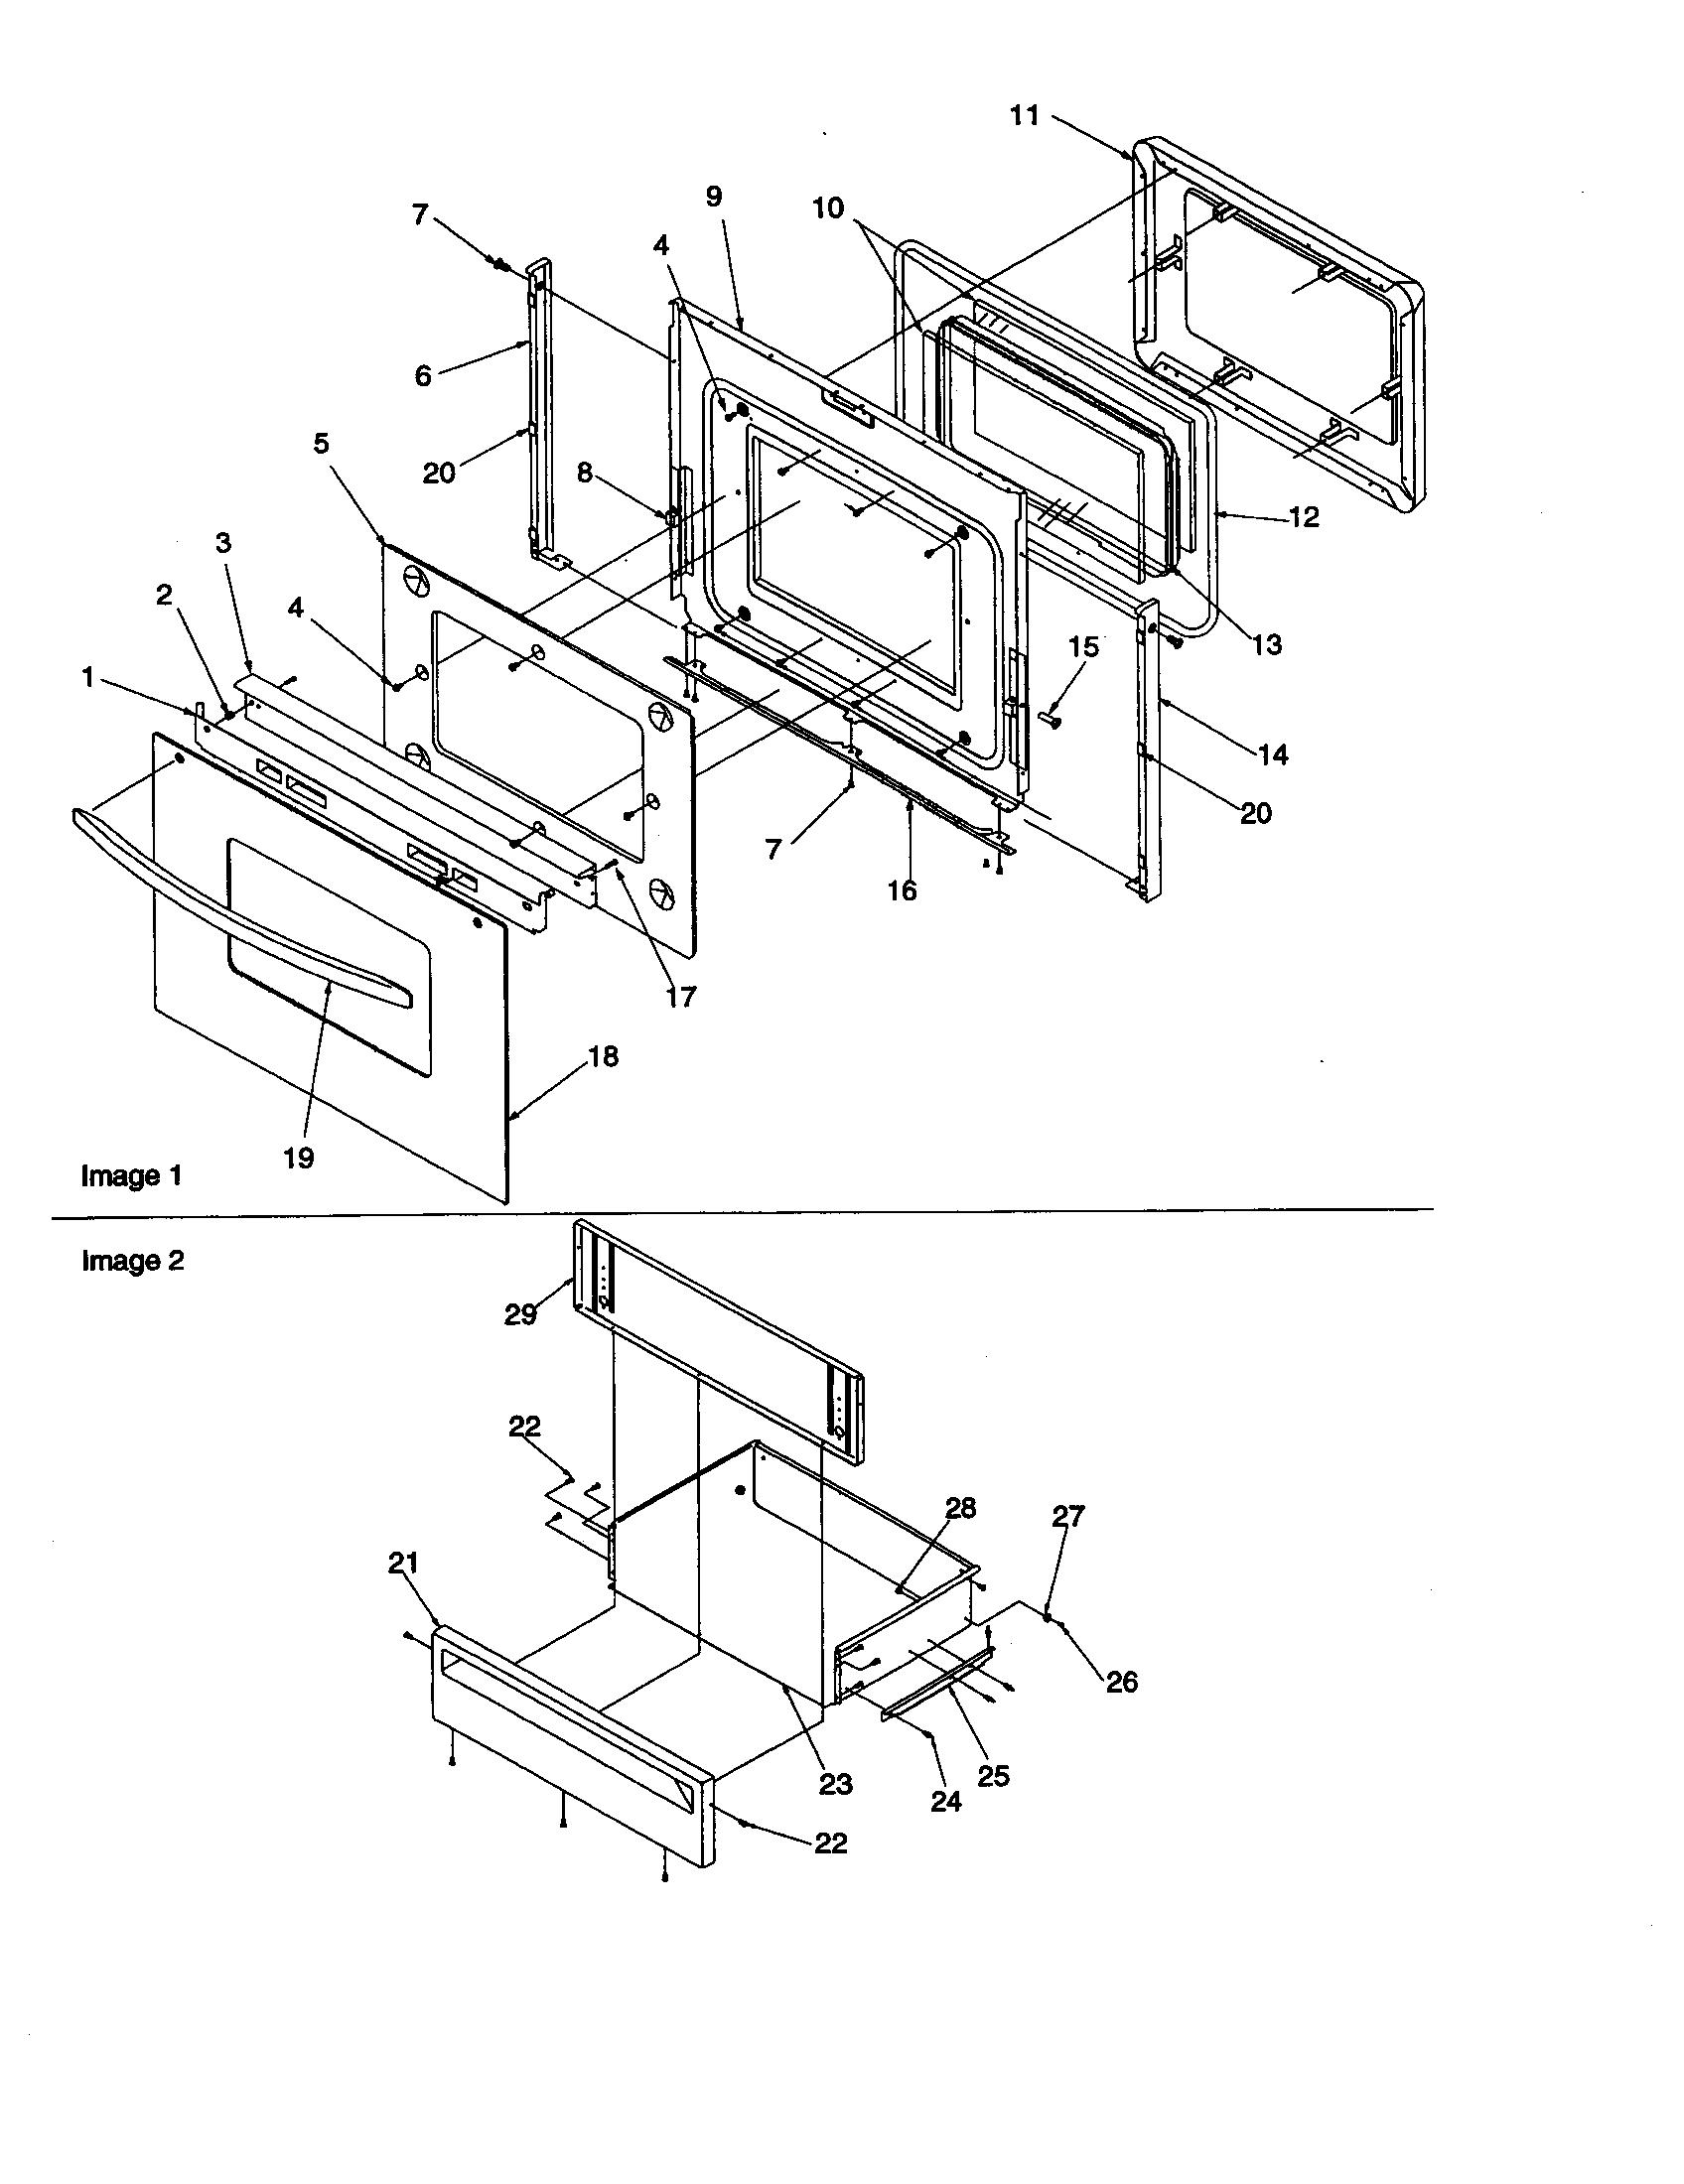 hight resolution of artc7511ww electric range oven door and storage drawer parts diagram